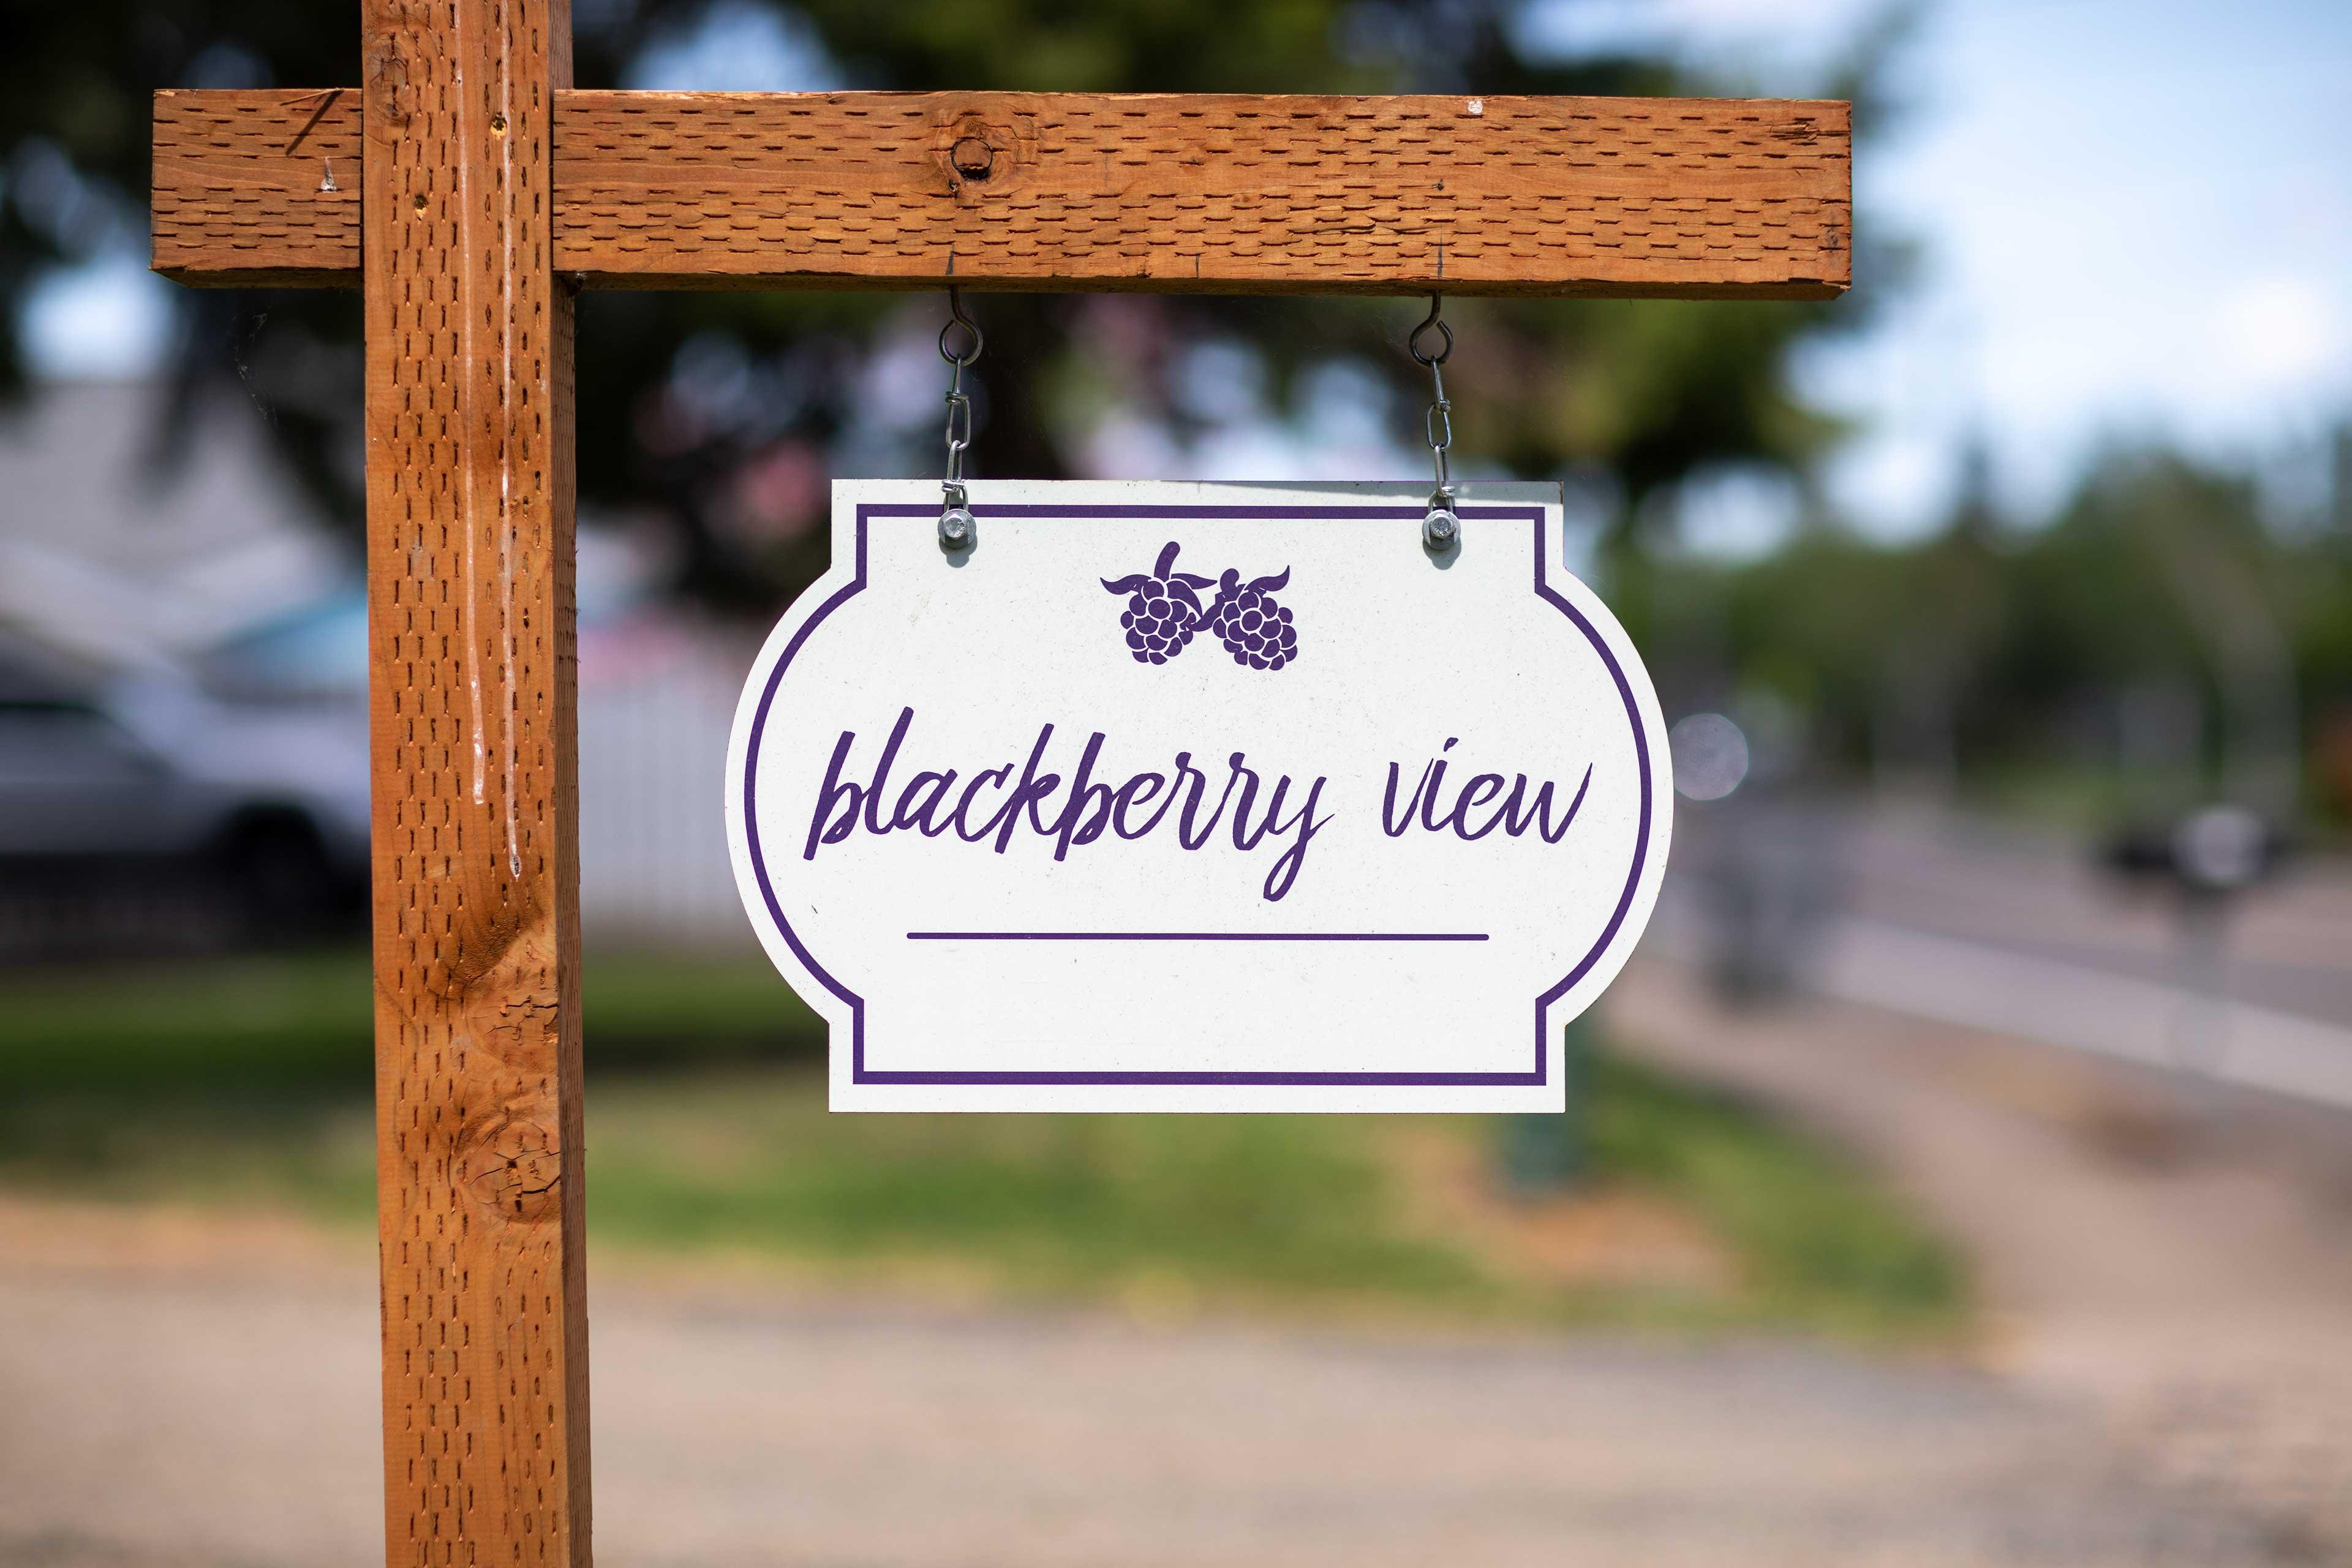 'Blackberry View'